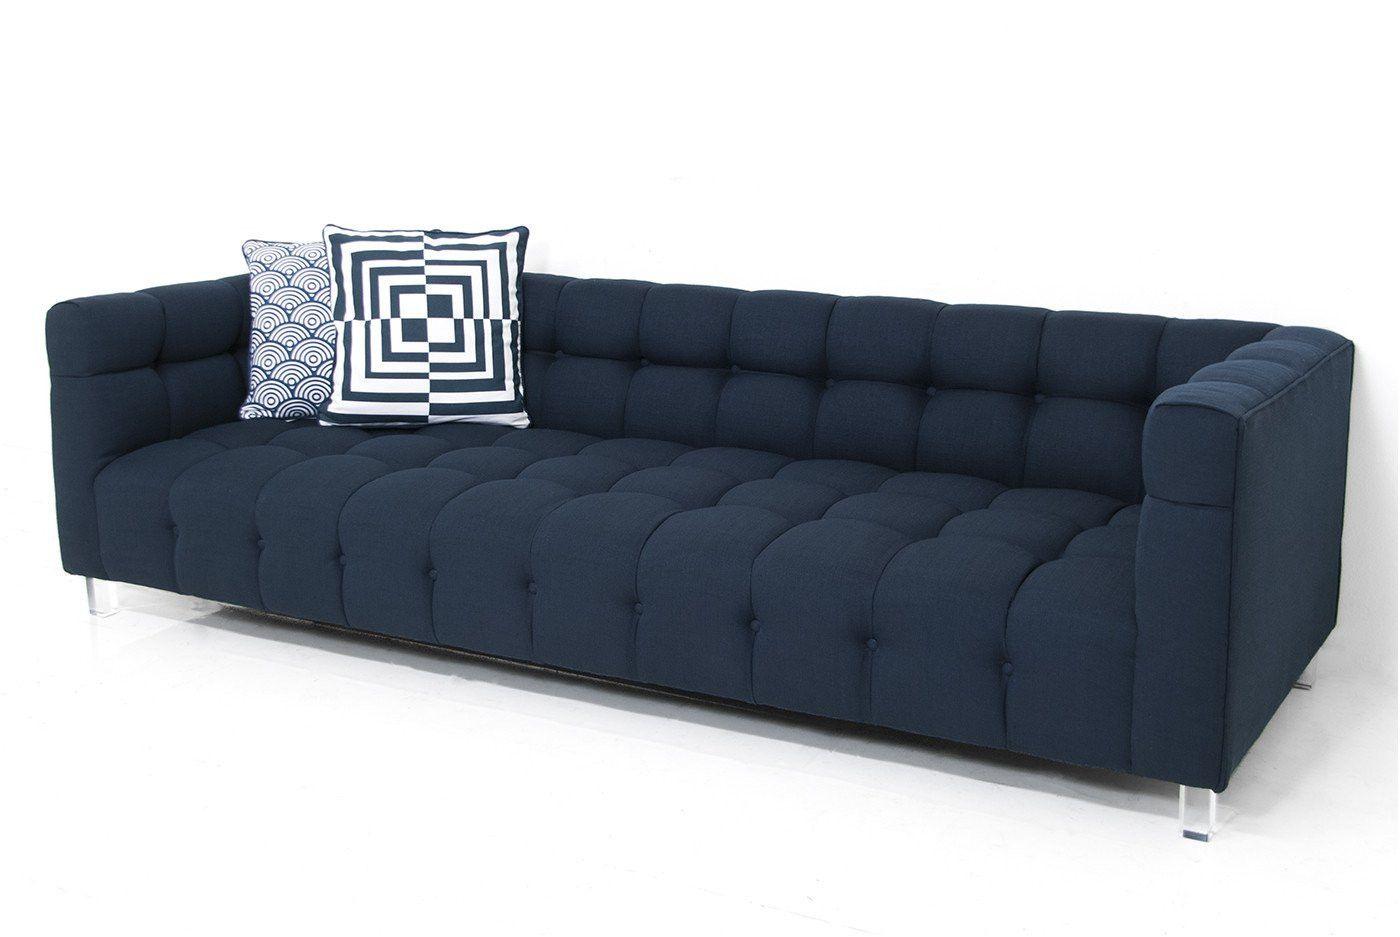 Clever Sofa Lederoptik Sofa Couch Decor